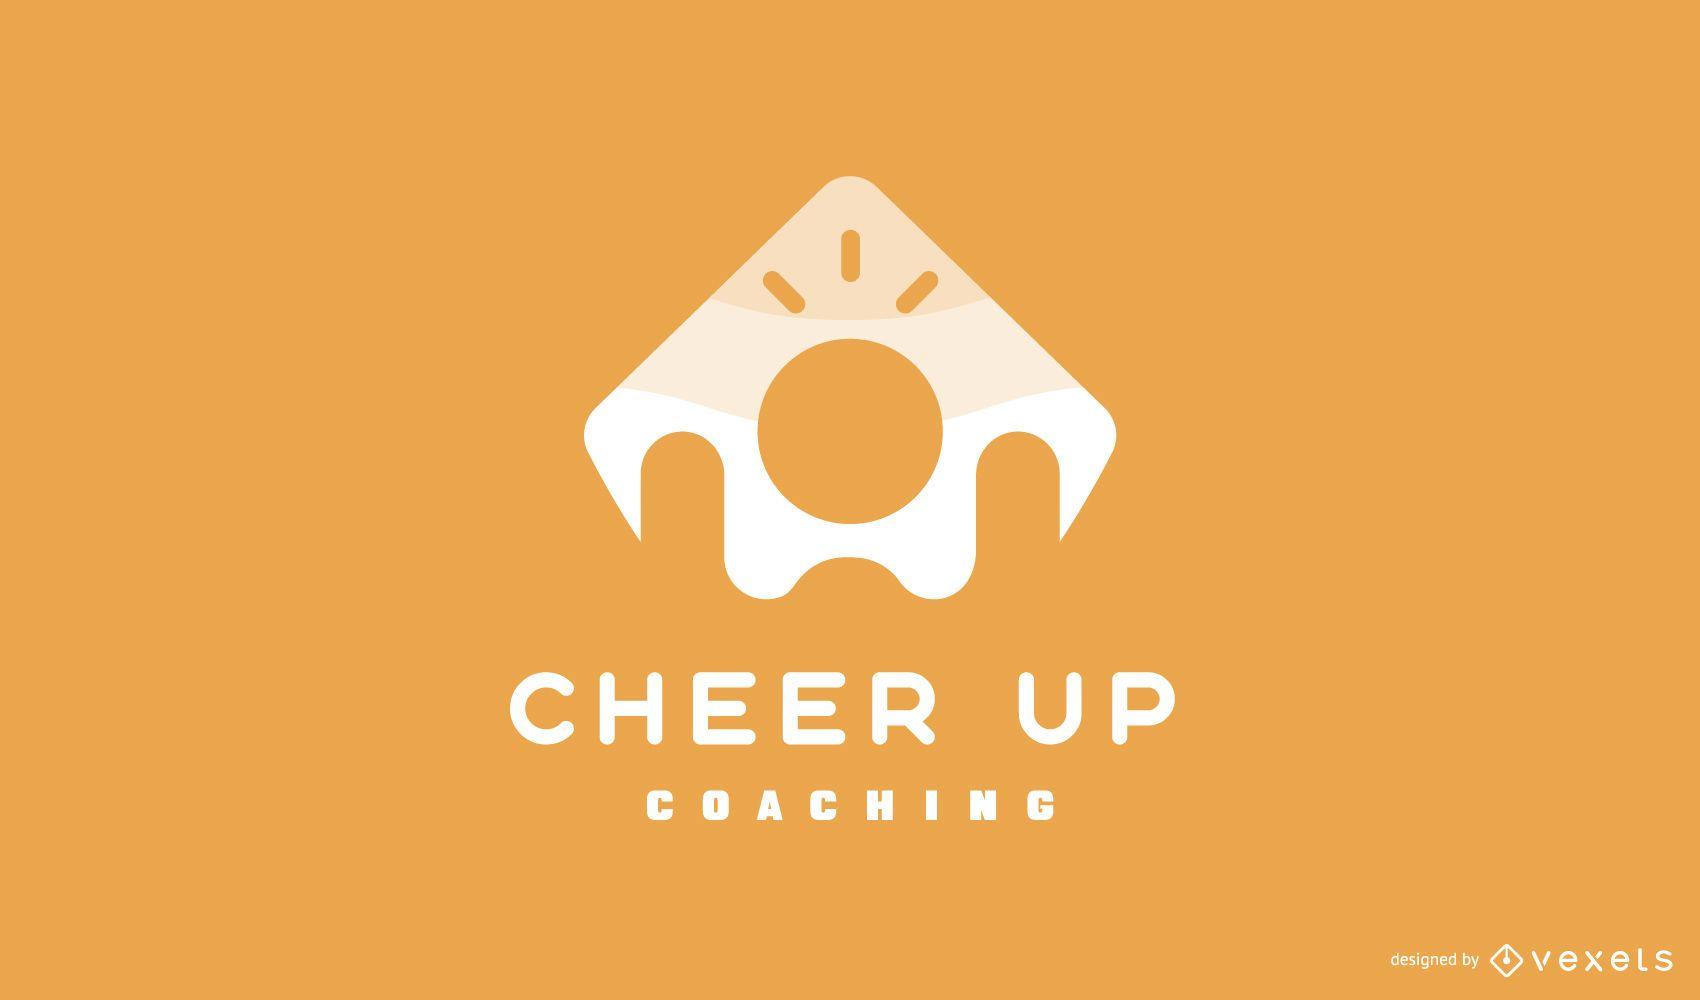 Cheer Up Coaching Logo Design